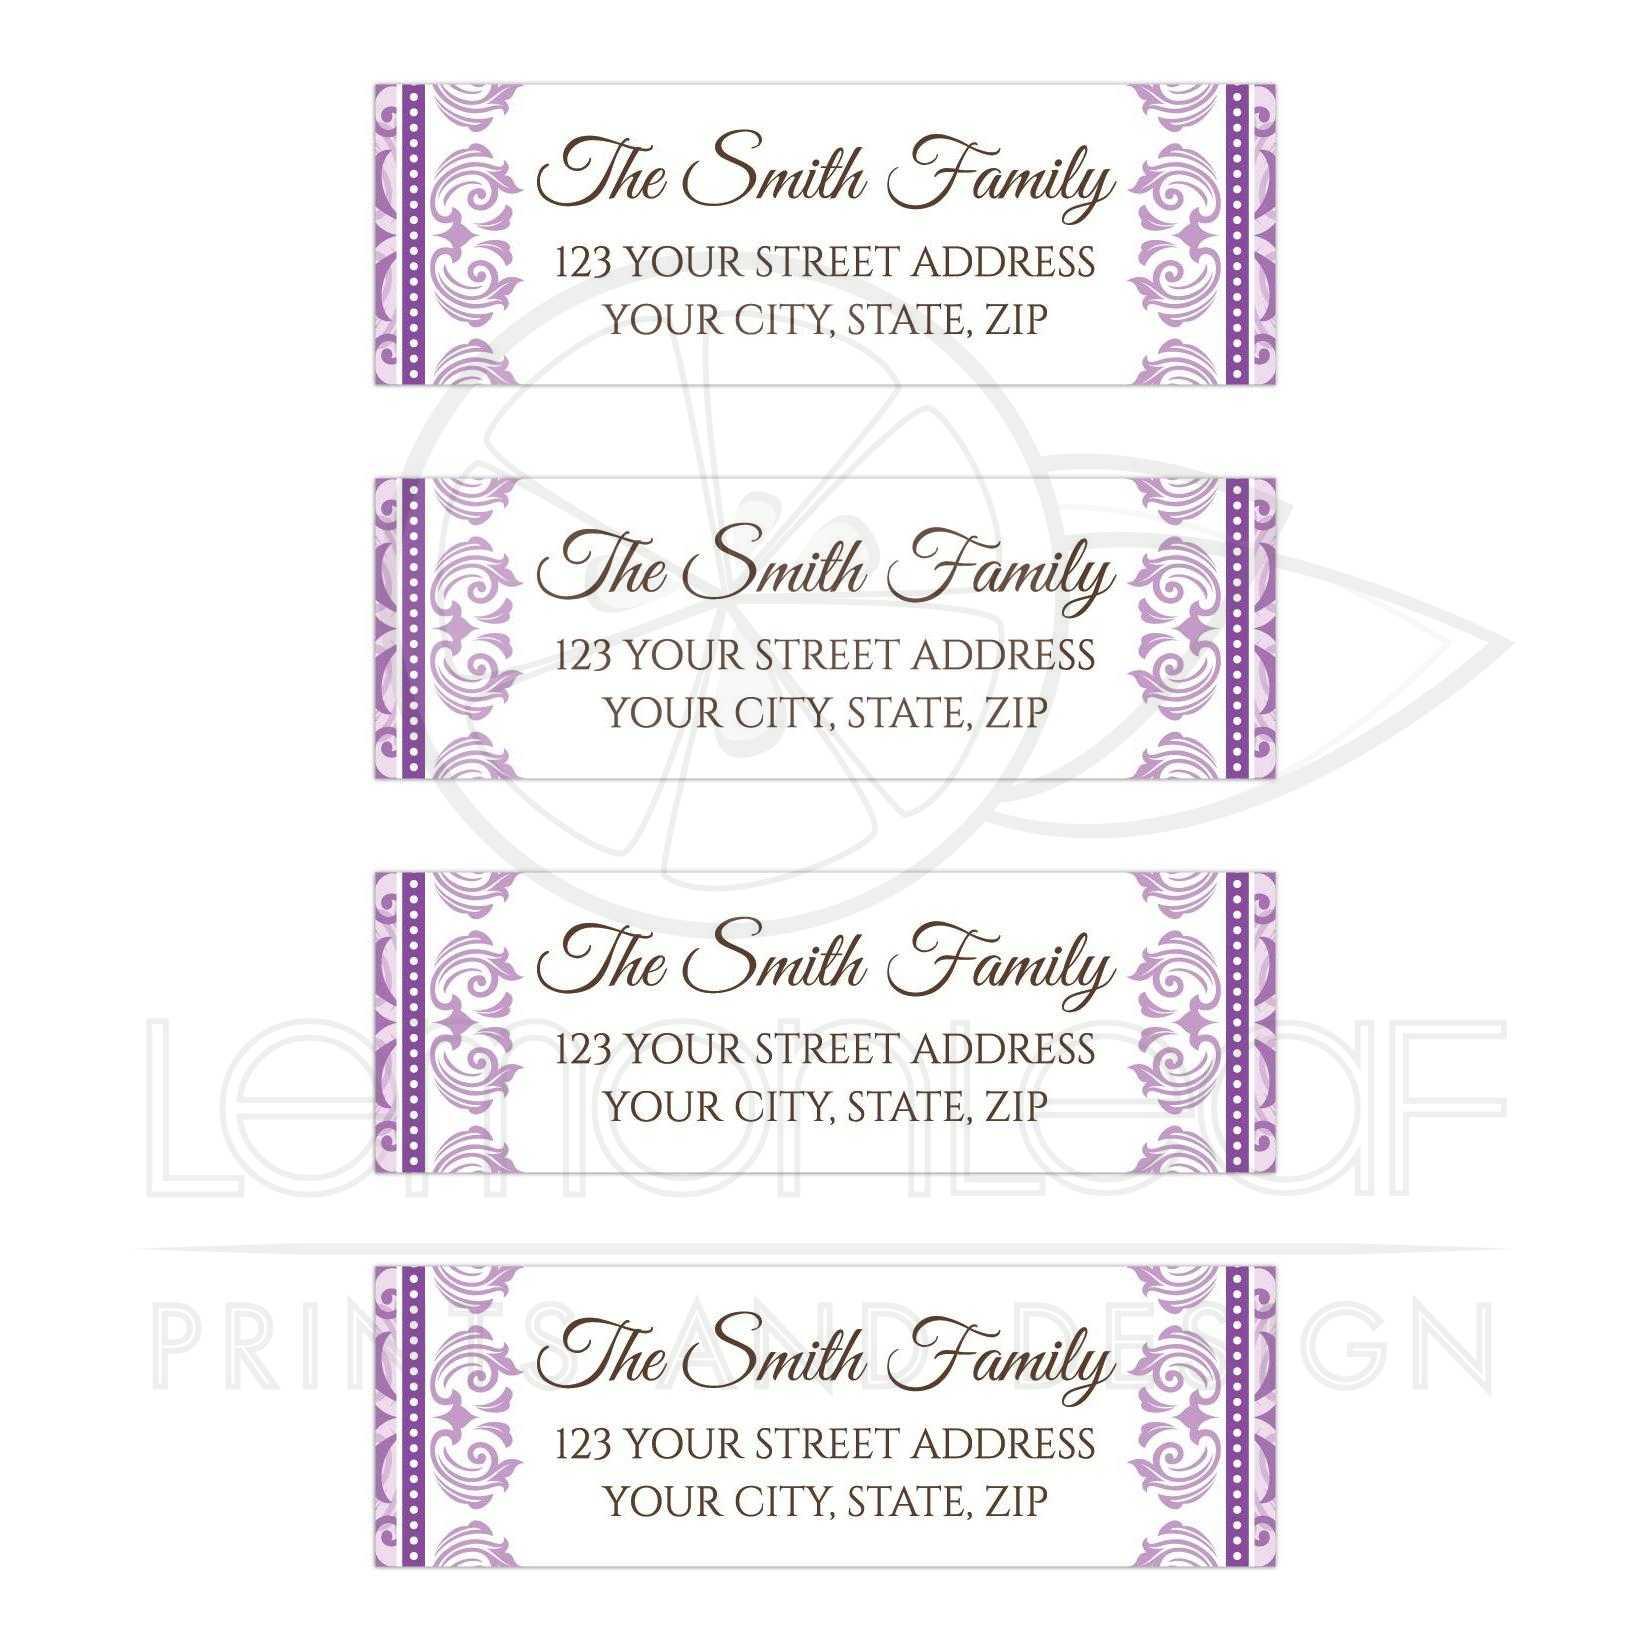 elegant purple mailing or return address labels with purple damask borders